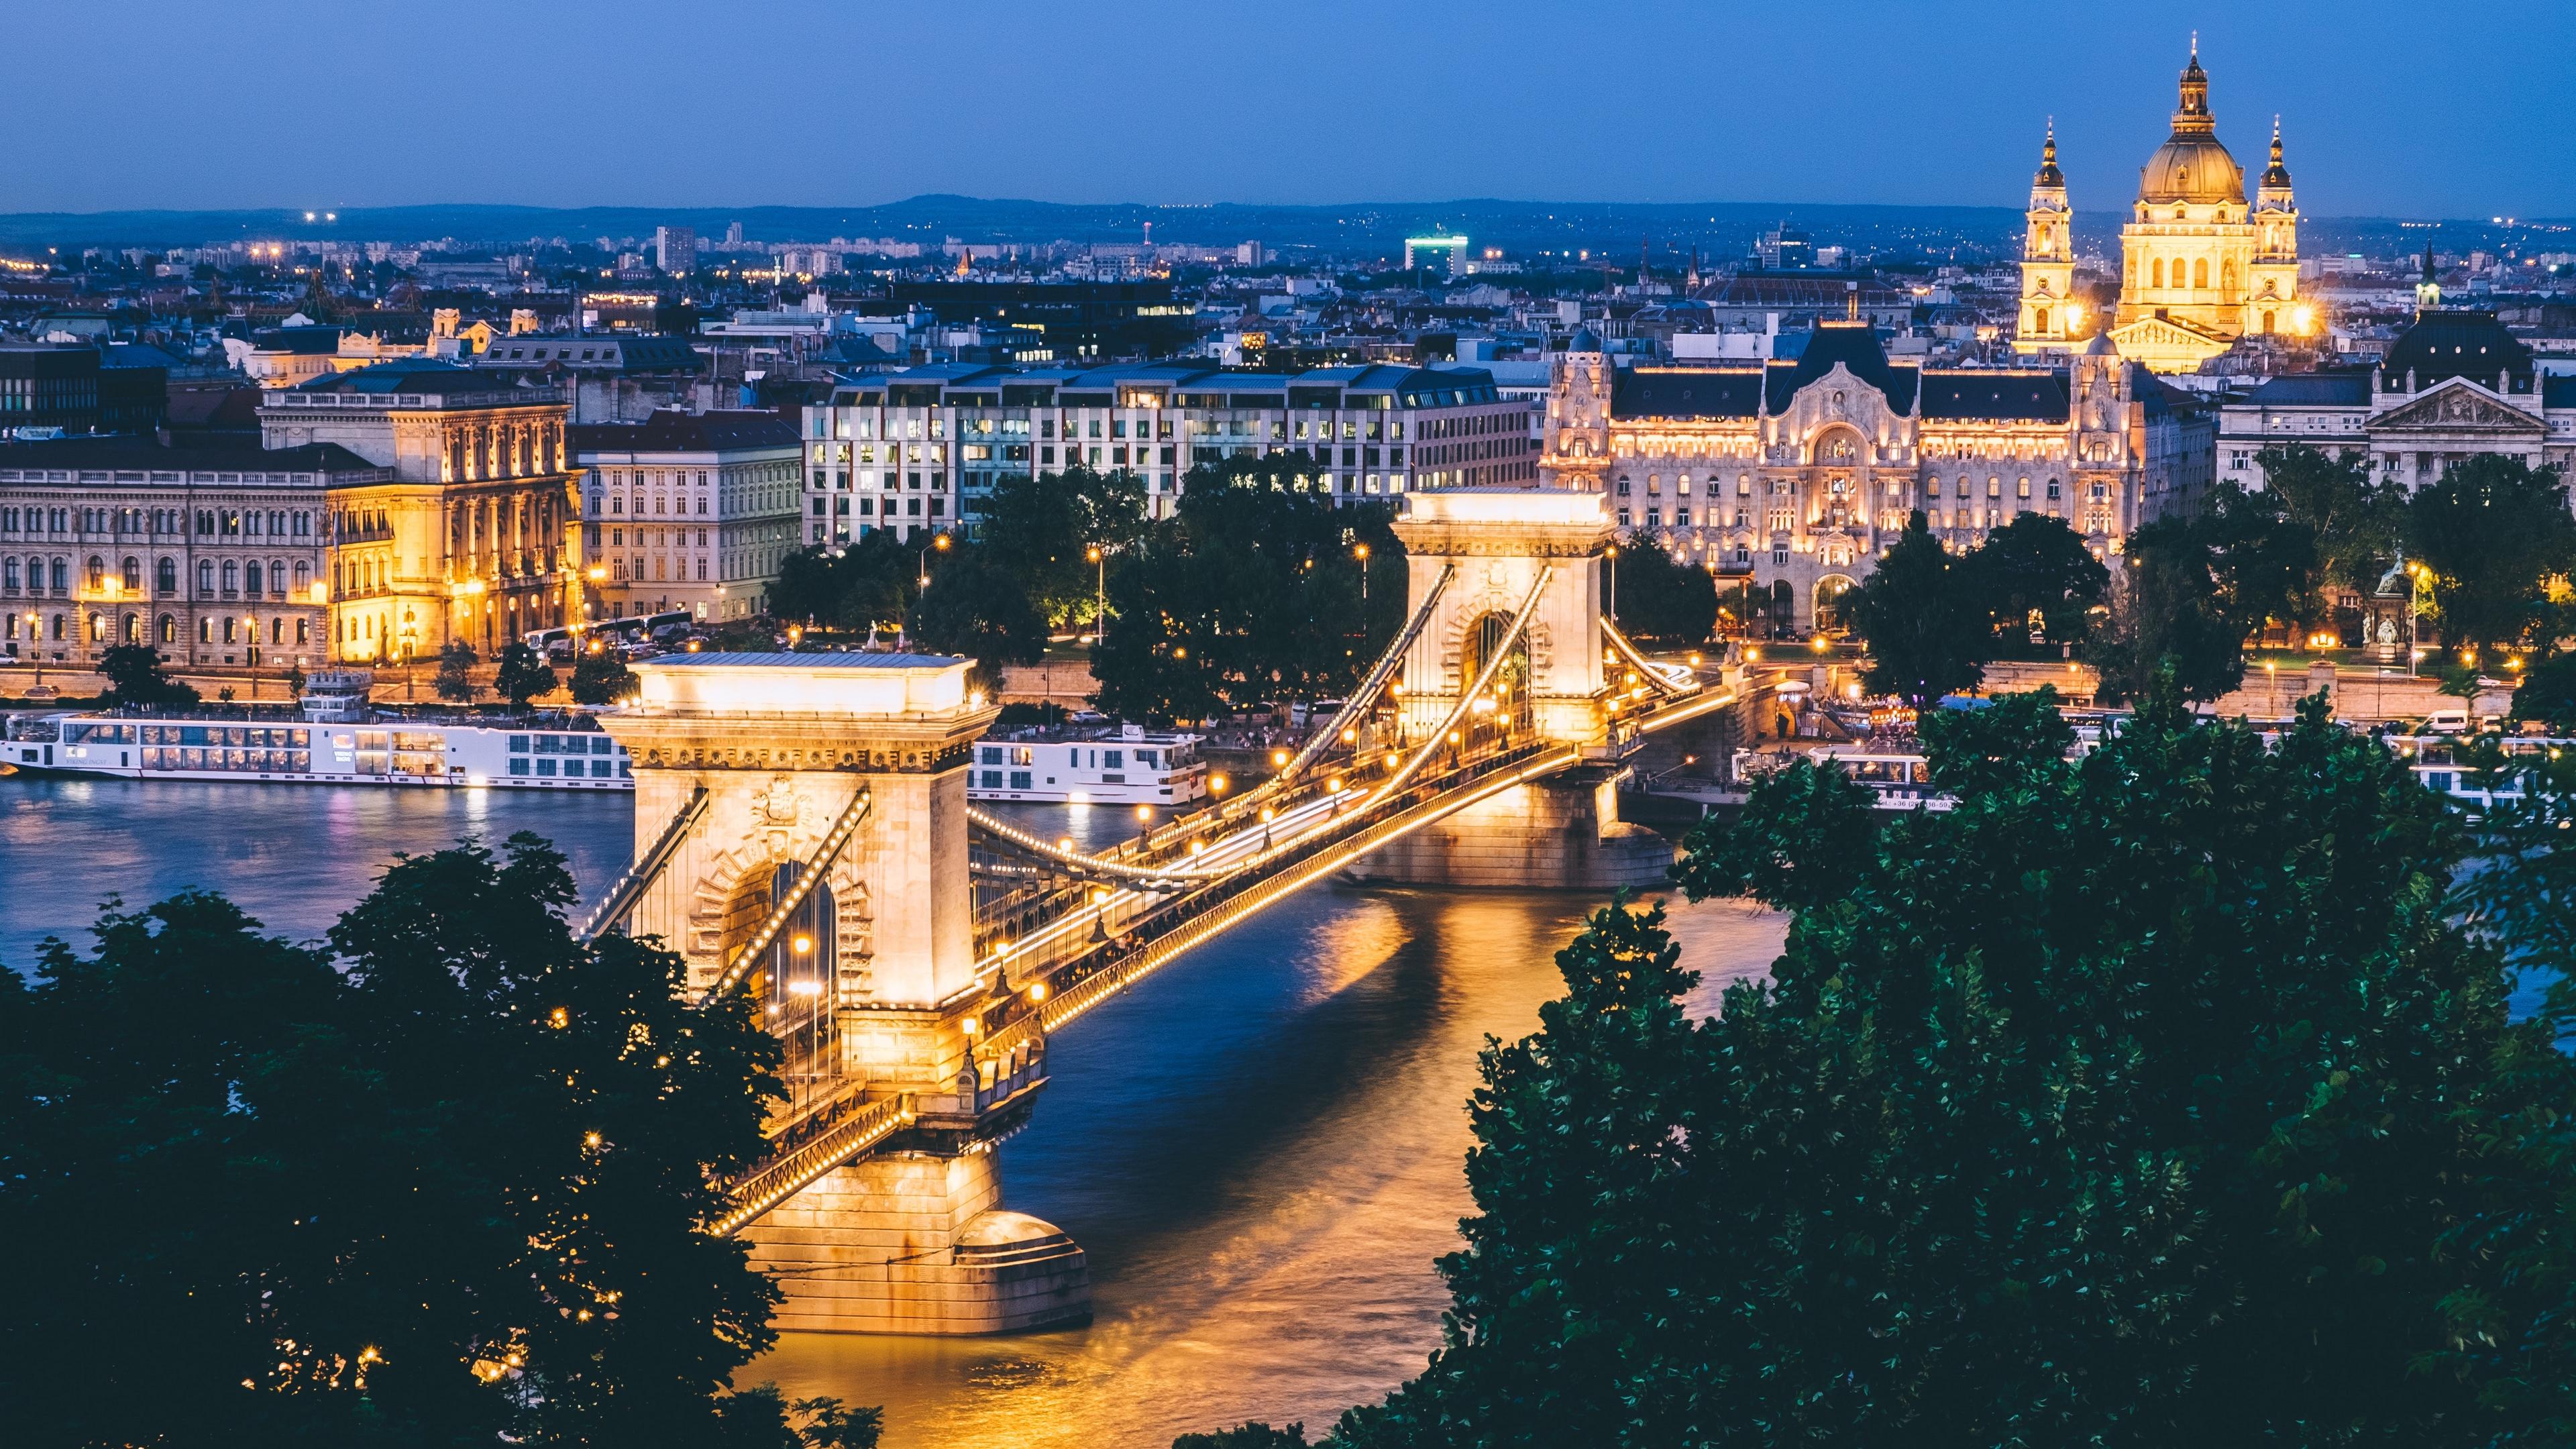 budapest hungary bridge night city 4k 1538065548 - budapest, hungary, bridge, night city 4k - hungary, Budapest, bridge